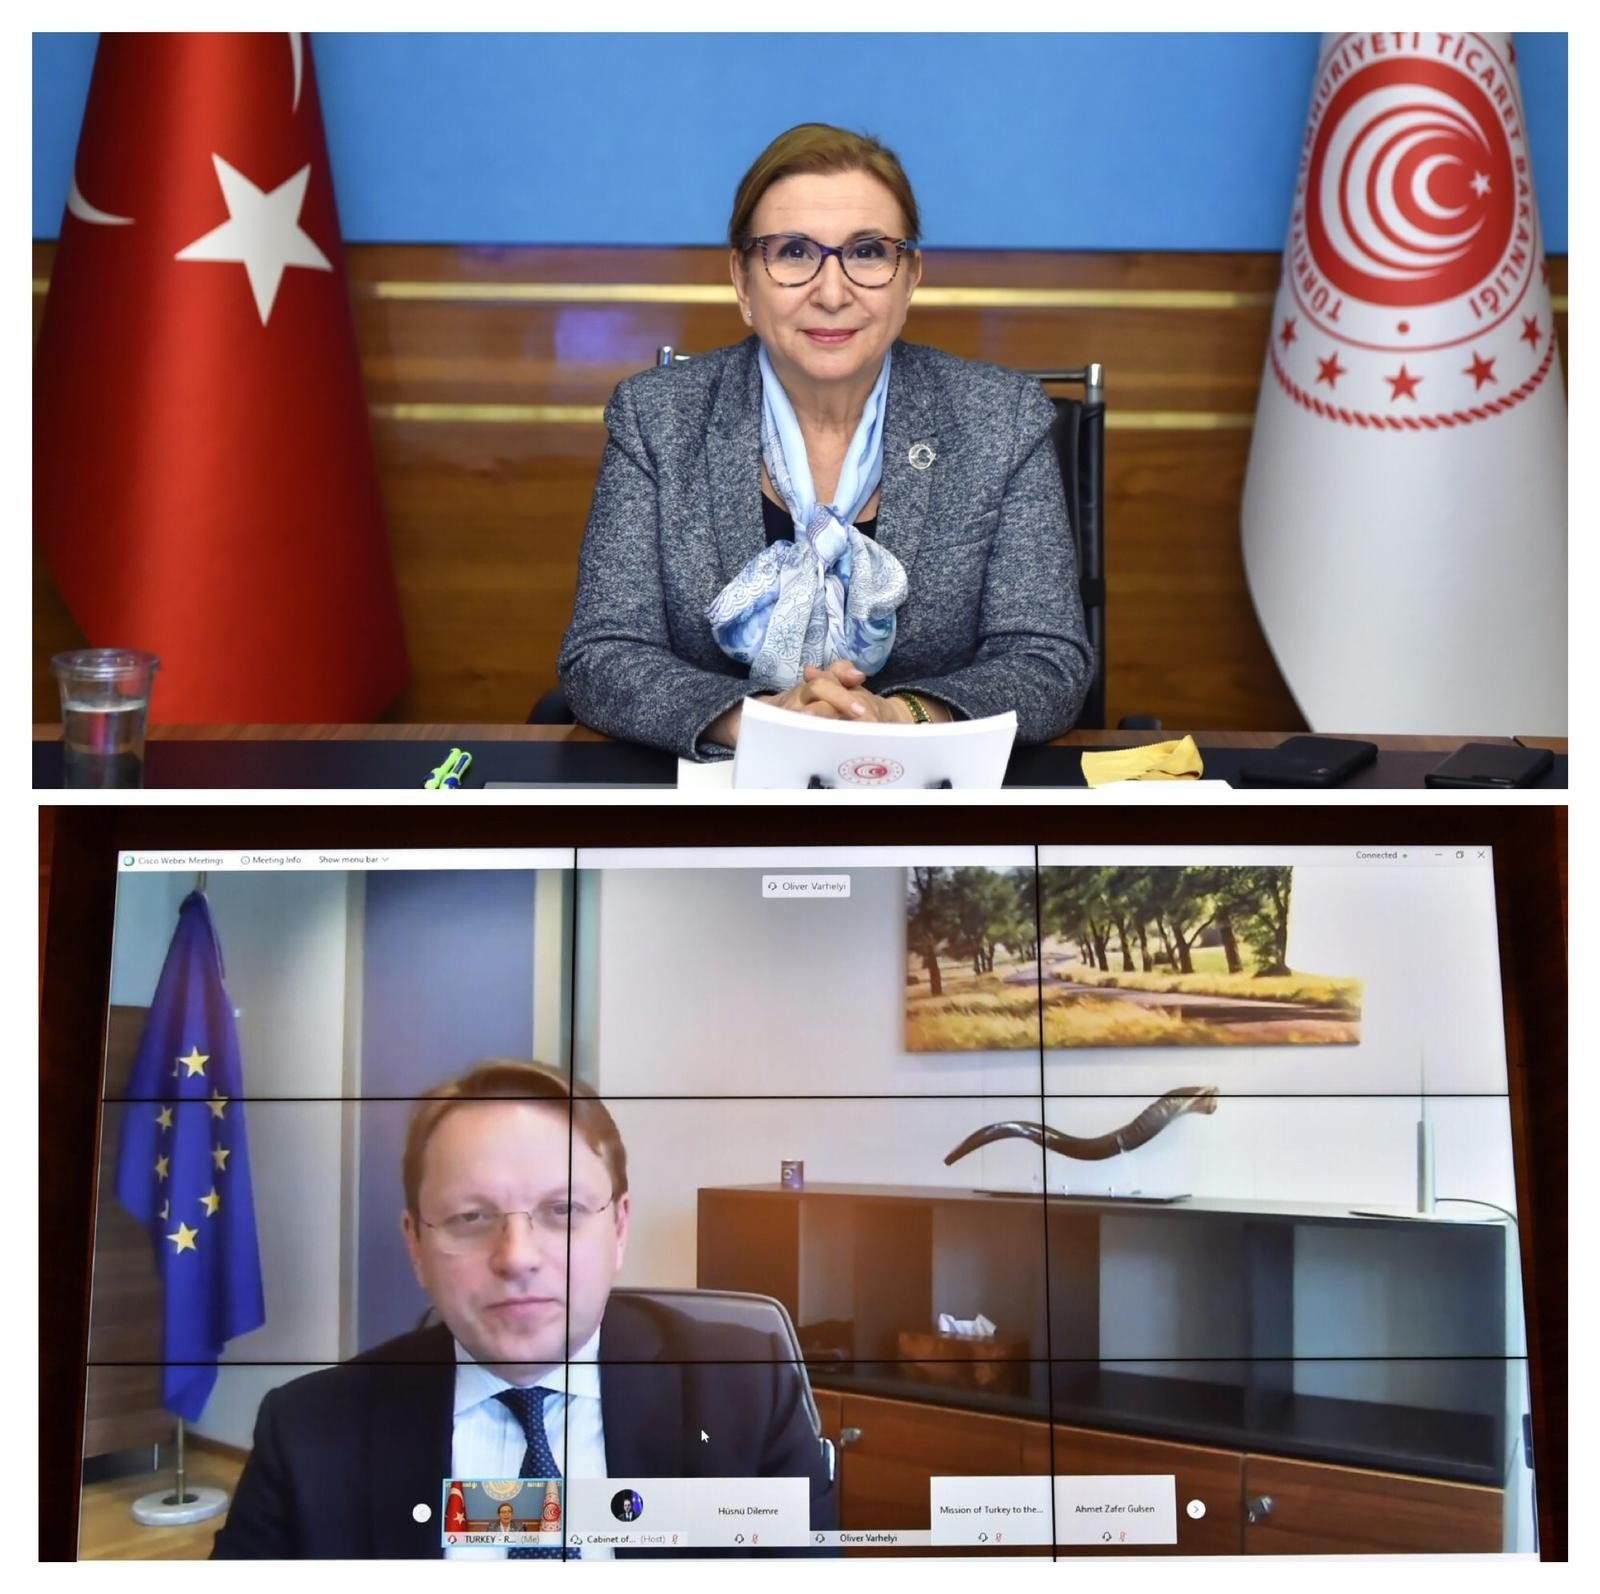 Turkey's Trade Minister Ruhsar Pekcan (above) andEuropean Neighborhood and Enlargement Commissioner Oliver Varhelyi during their virtual meeting, Feb. 23, 2021. (IHA Photo)